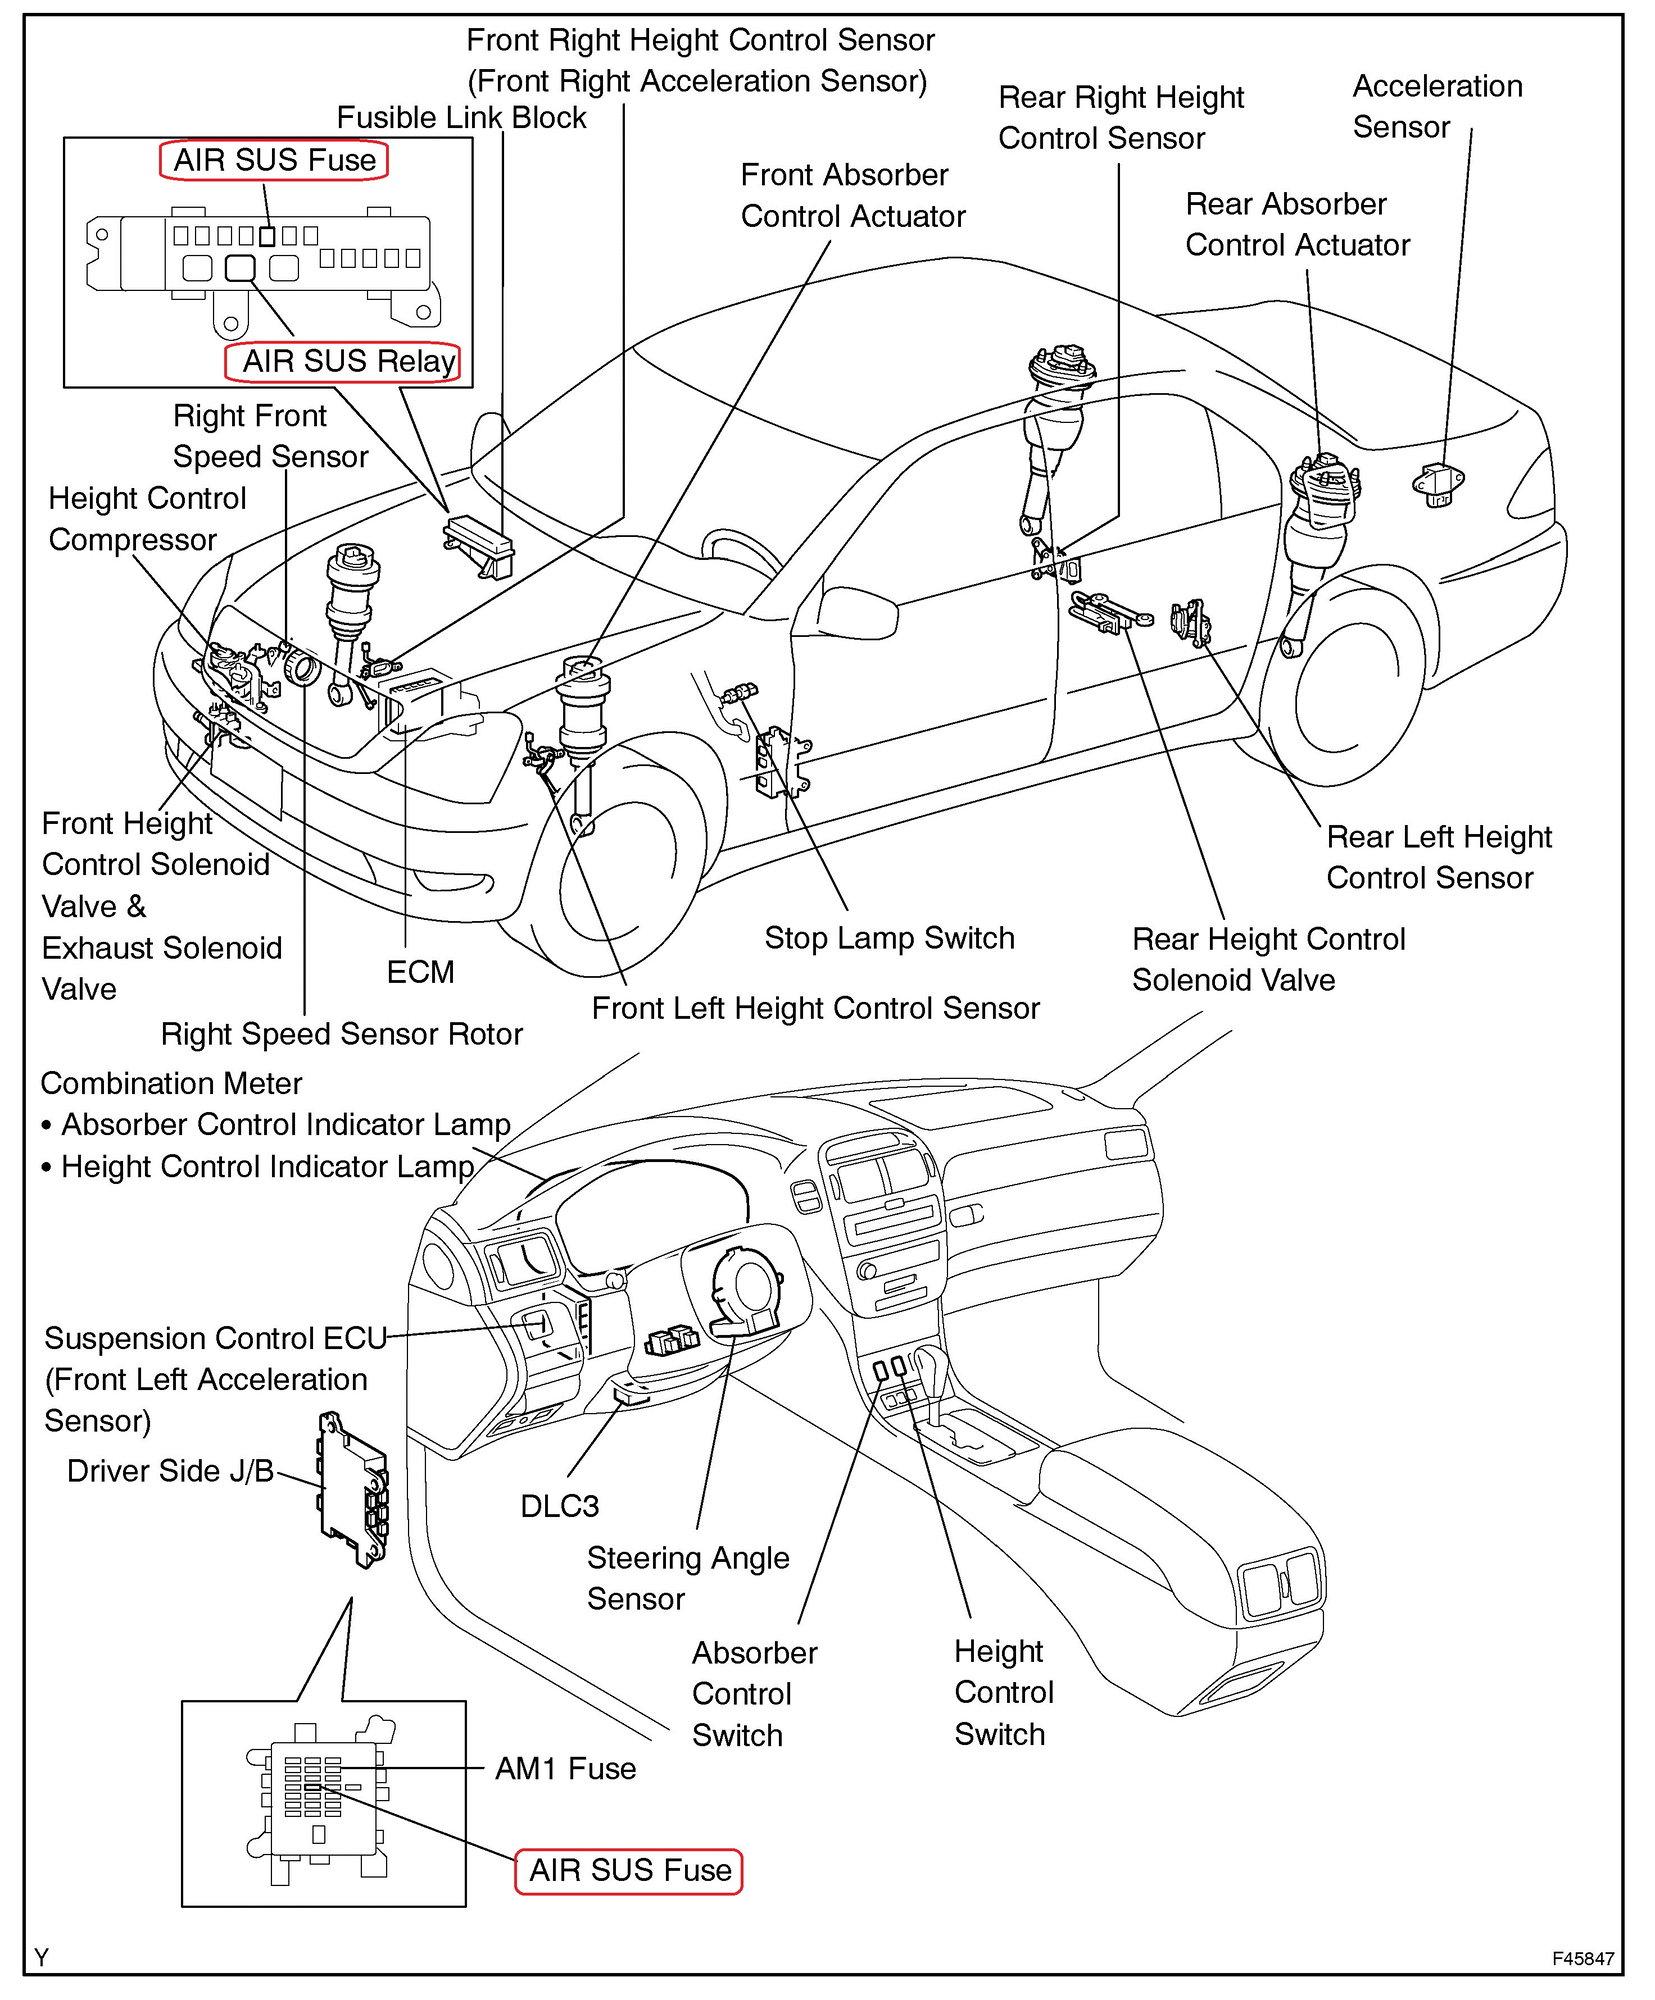 2003 saab 93 fuse box diagram wiring